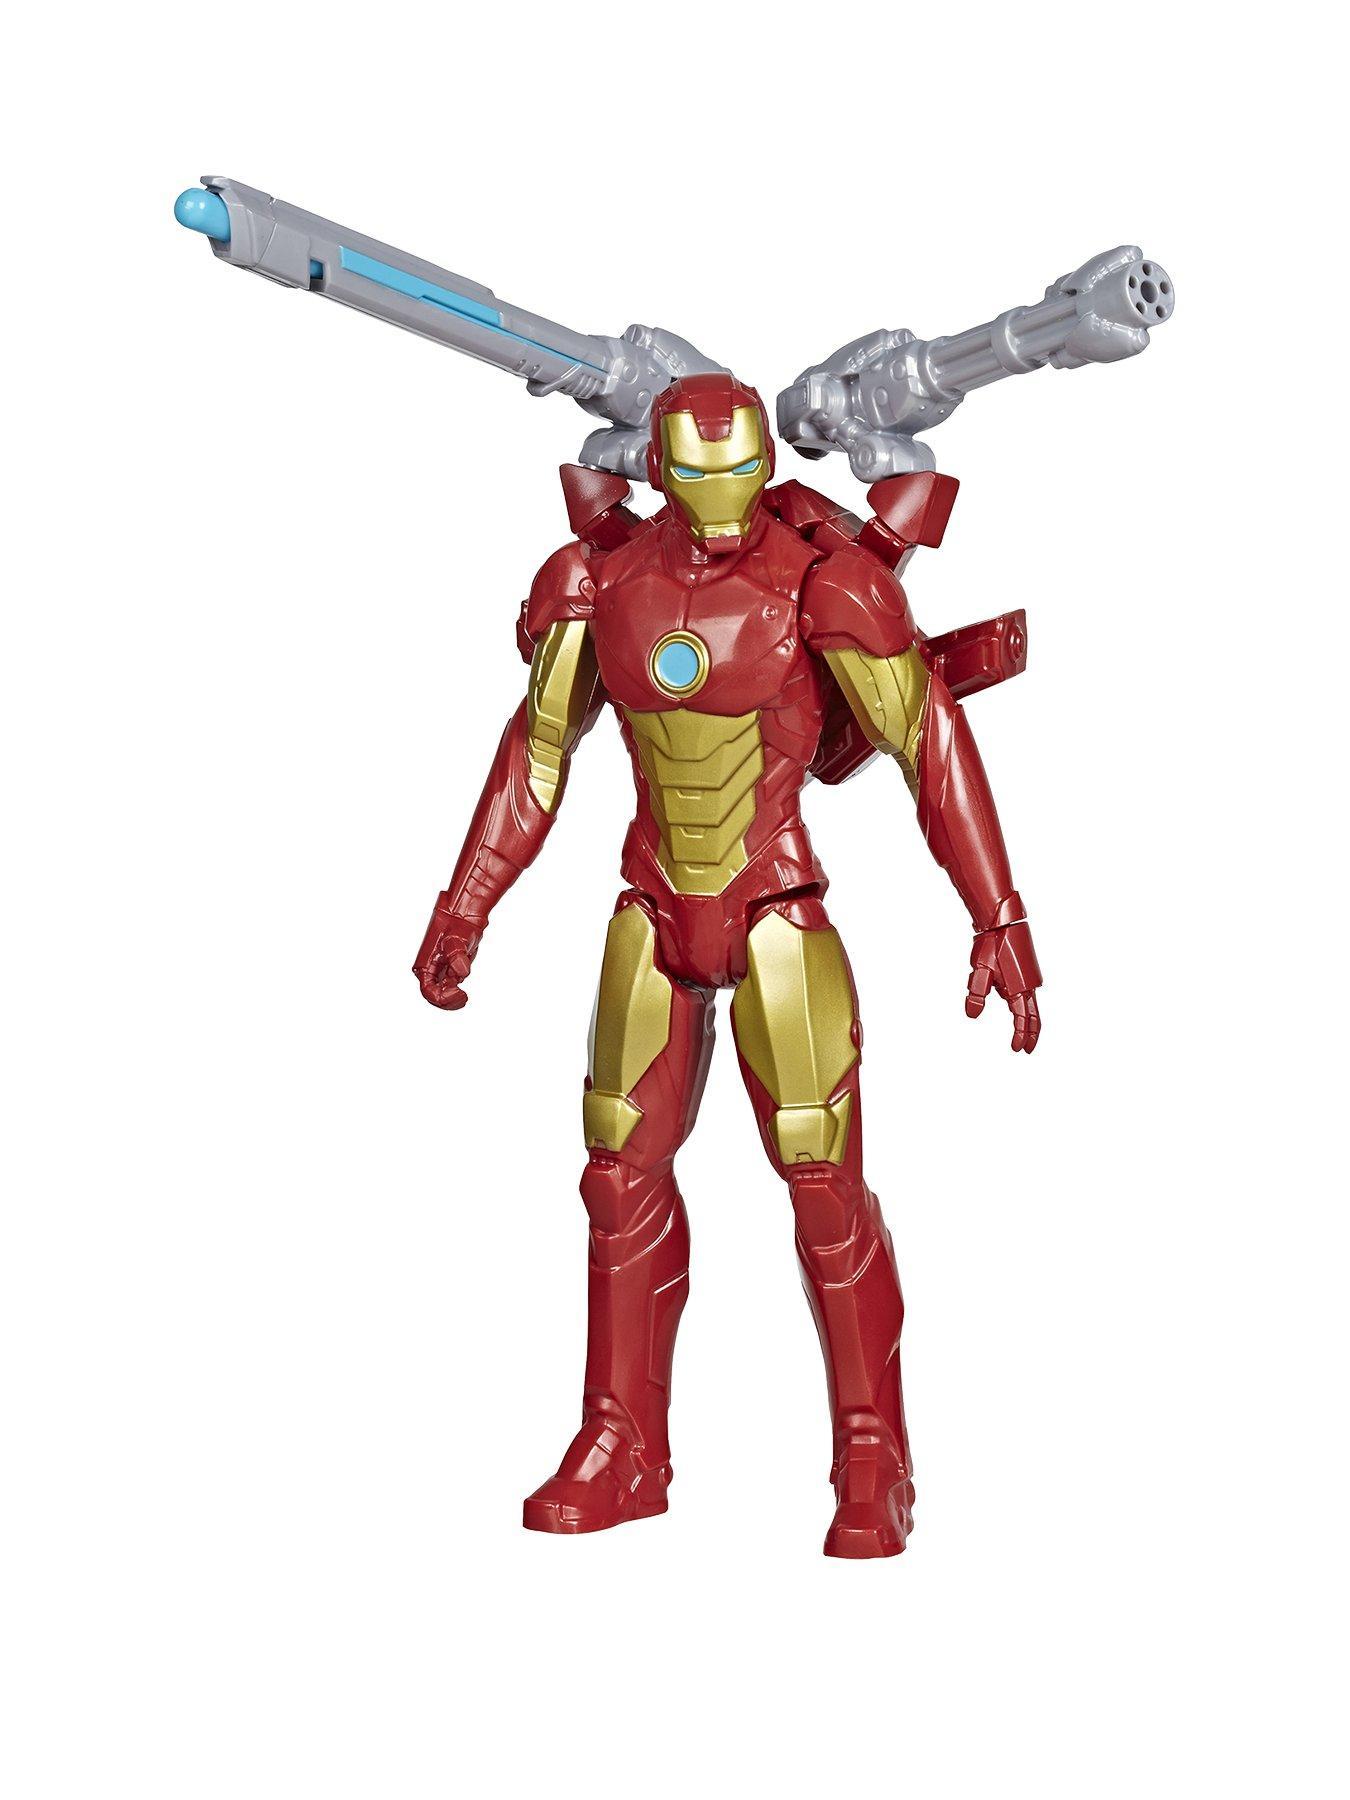 Figure. MARVEL Super Héros des Avengers Iron Man 11 in environ 27.94 cm